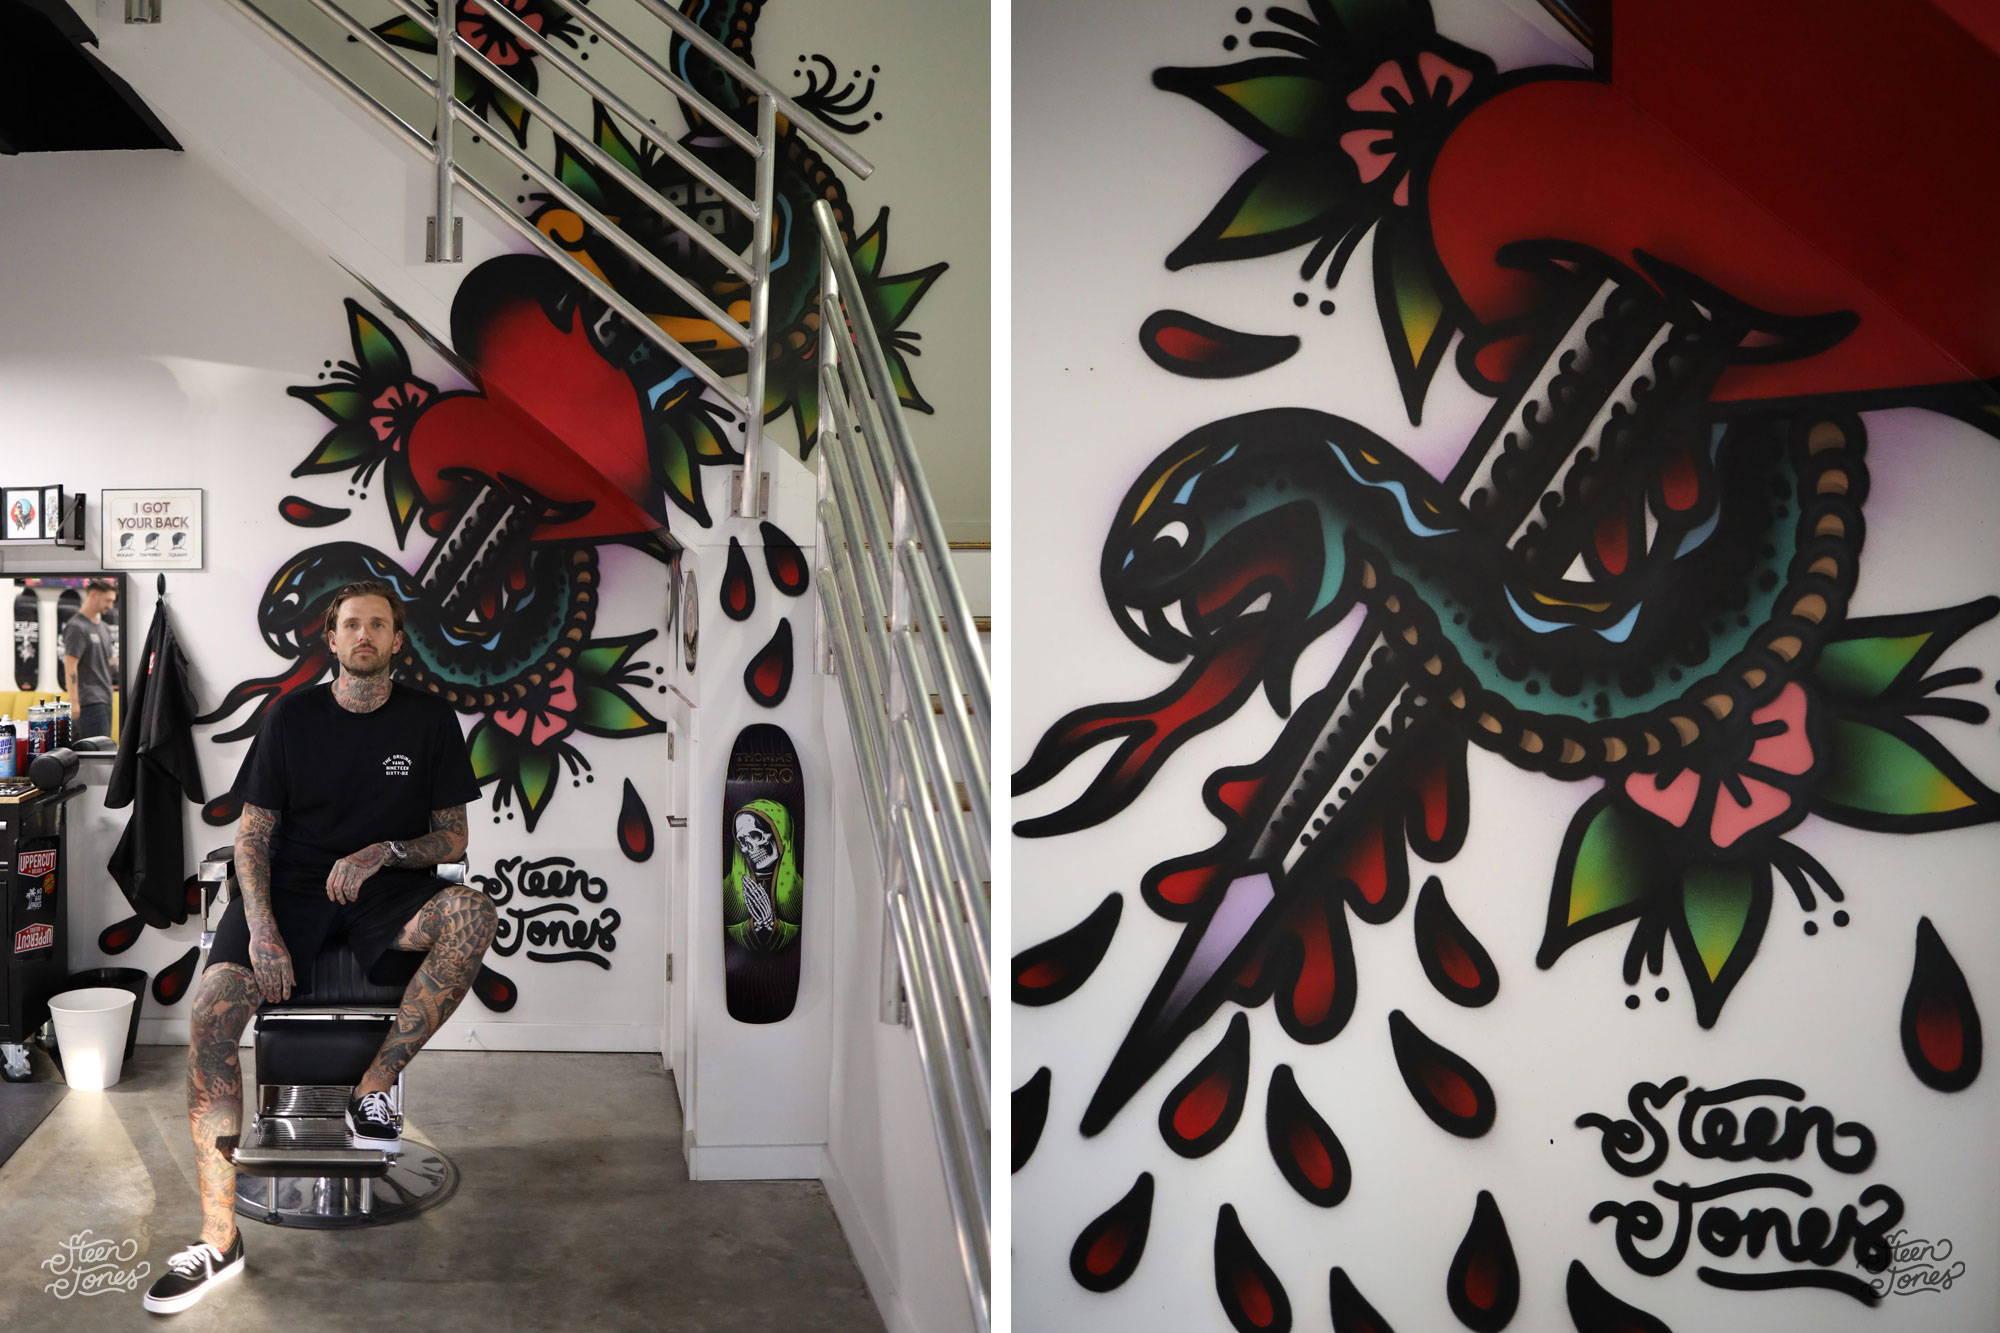 Steen Jones tattoo street artist Queen St Barbershop Wilmington USA mural